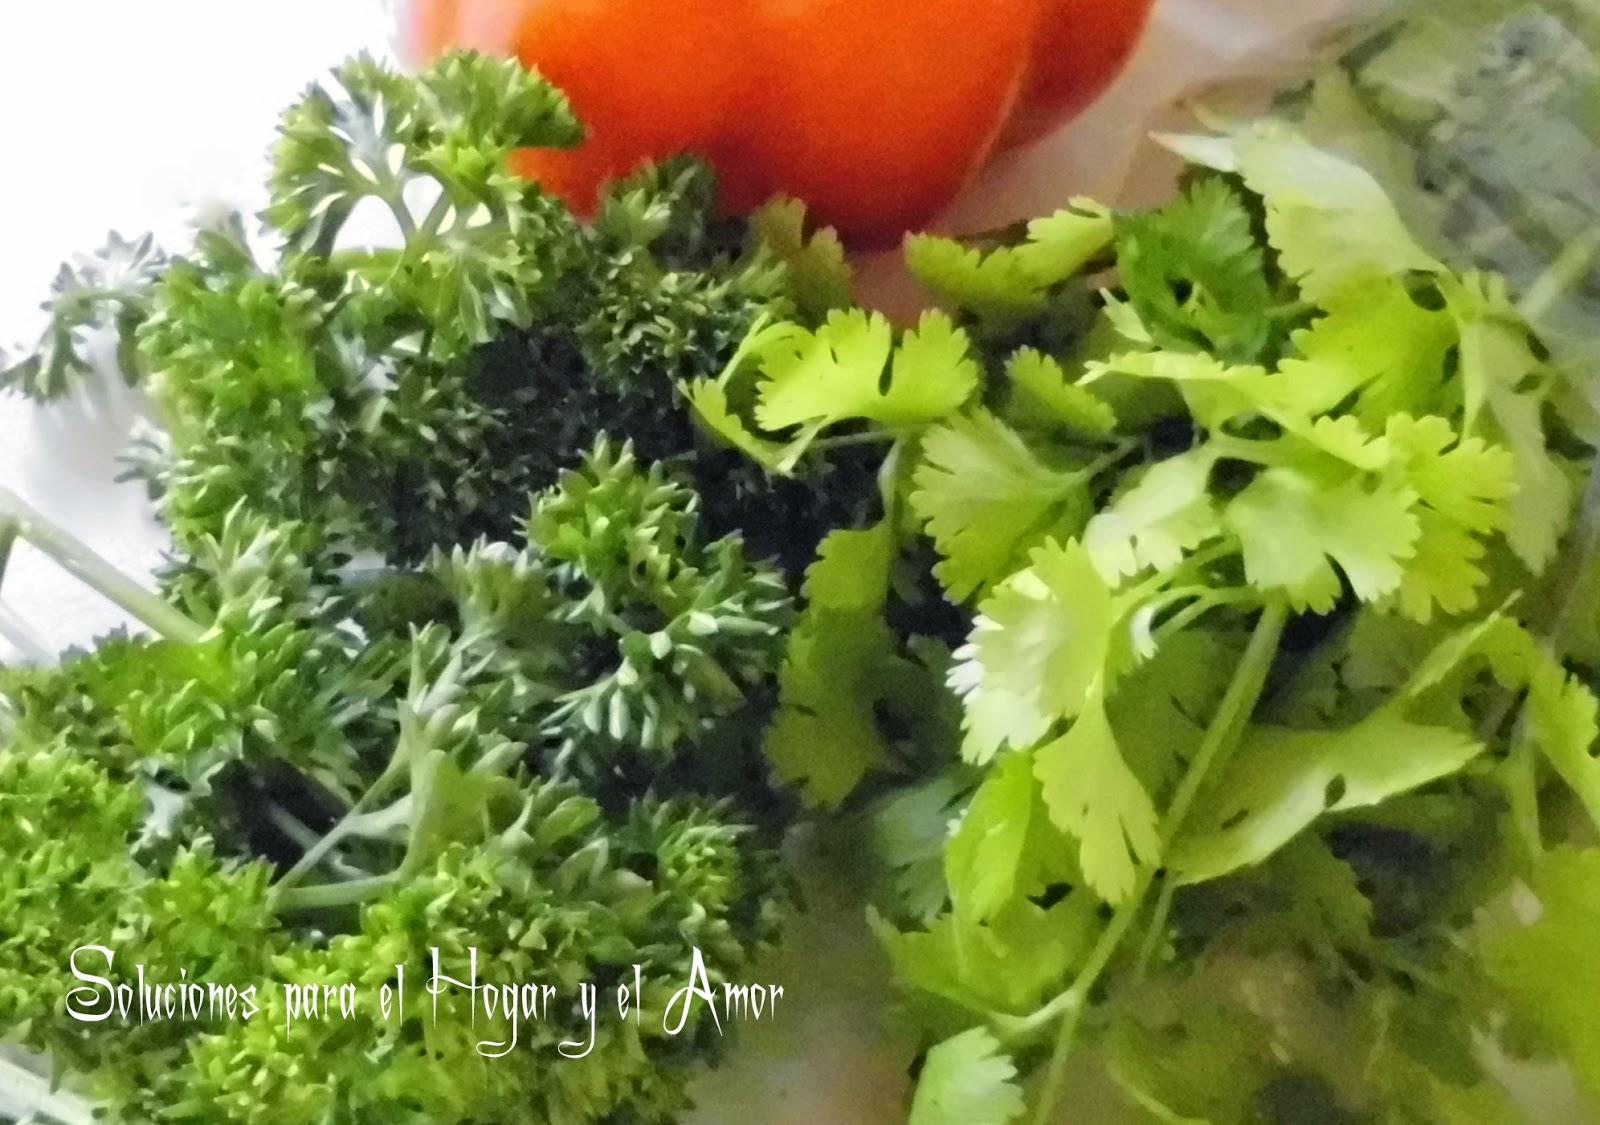 Sopa de Capirotadas, perejil, cilantro, culantro, yerbas aromáticas, receta de cocina